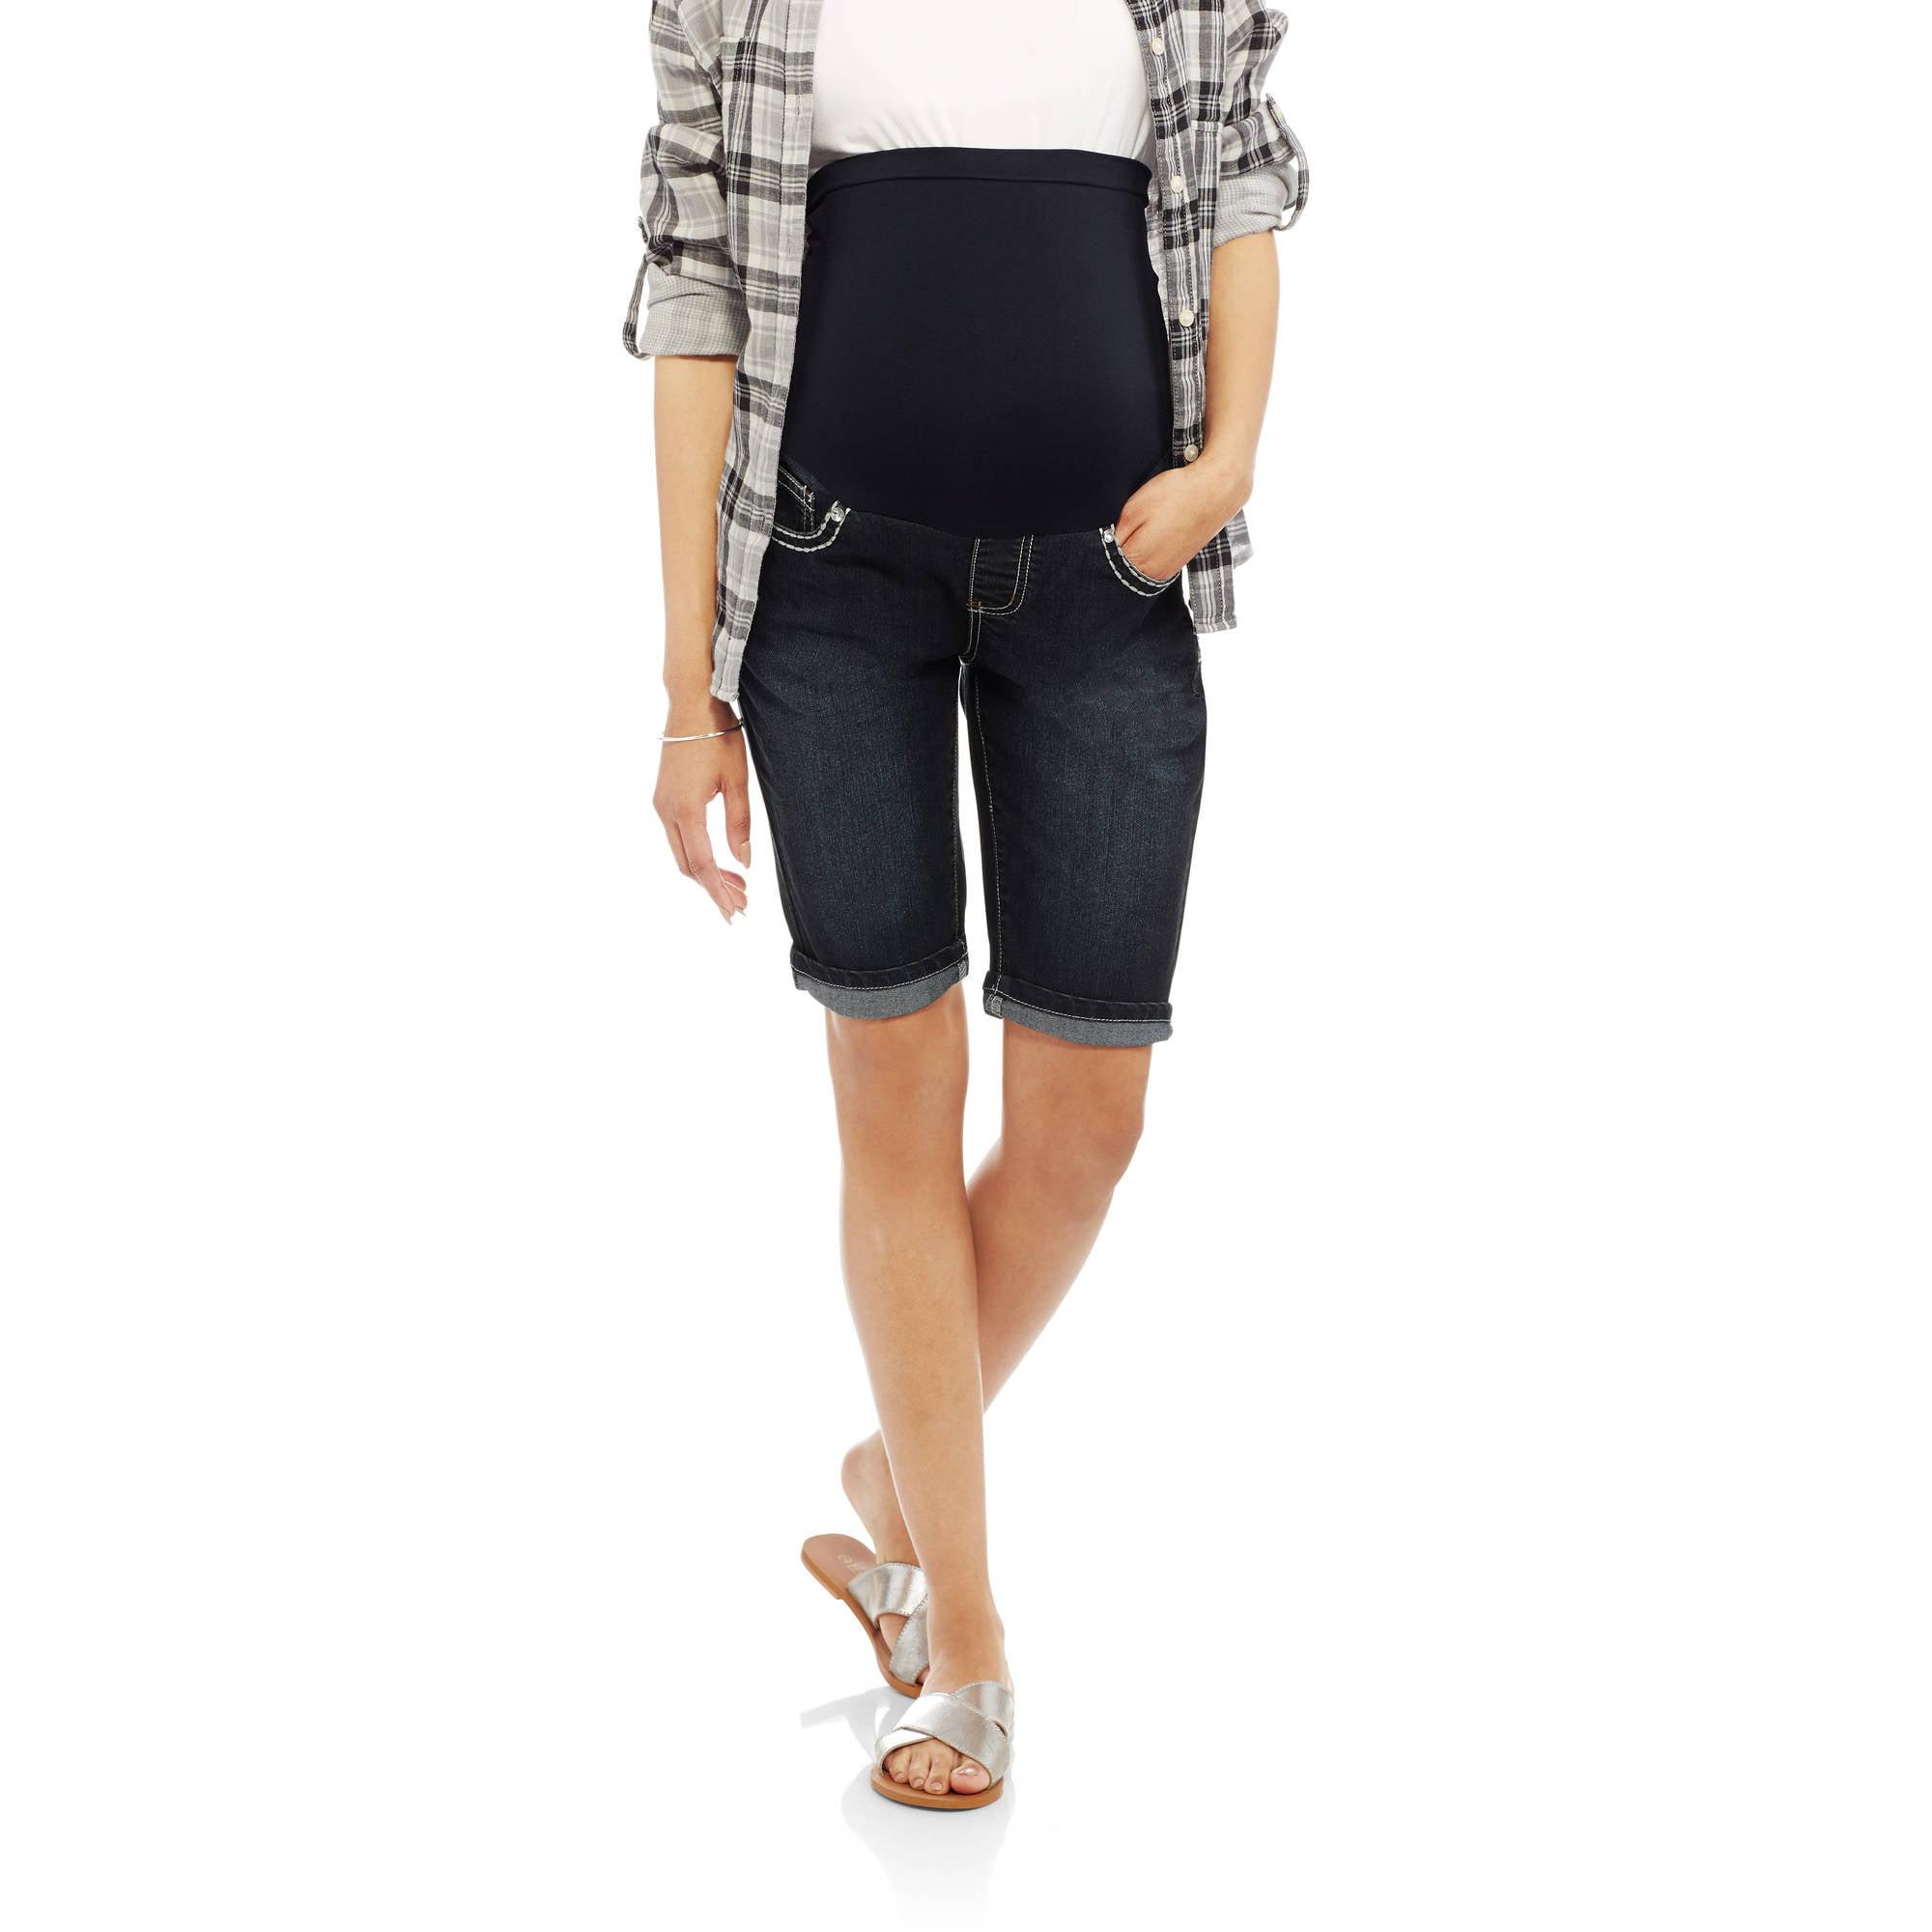 Denim Diva Maternity Full Panel Embellished Flap Back Pocket Shorts - Available in Plus Sizes